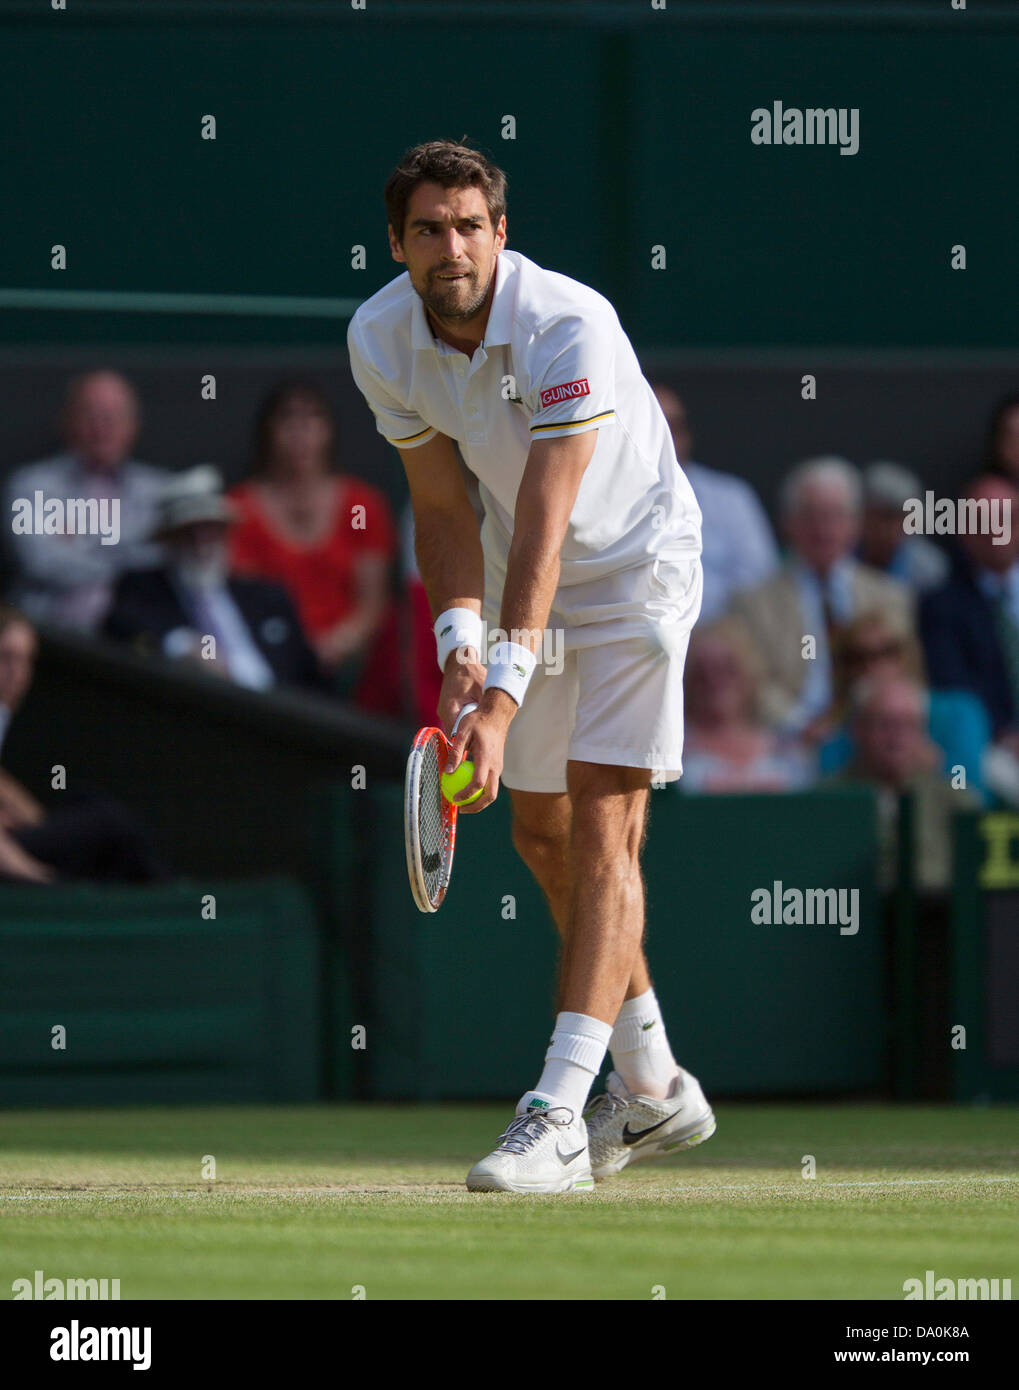 29-06-13, England, London, AELTC, Wimbledon, Tennis, Wimbledon 2013, Day six, Jeremy Chardy (FRA) Photo: Henk Koster - Stock Image